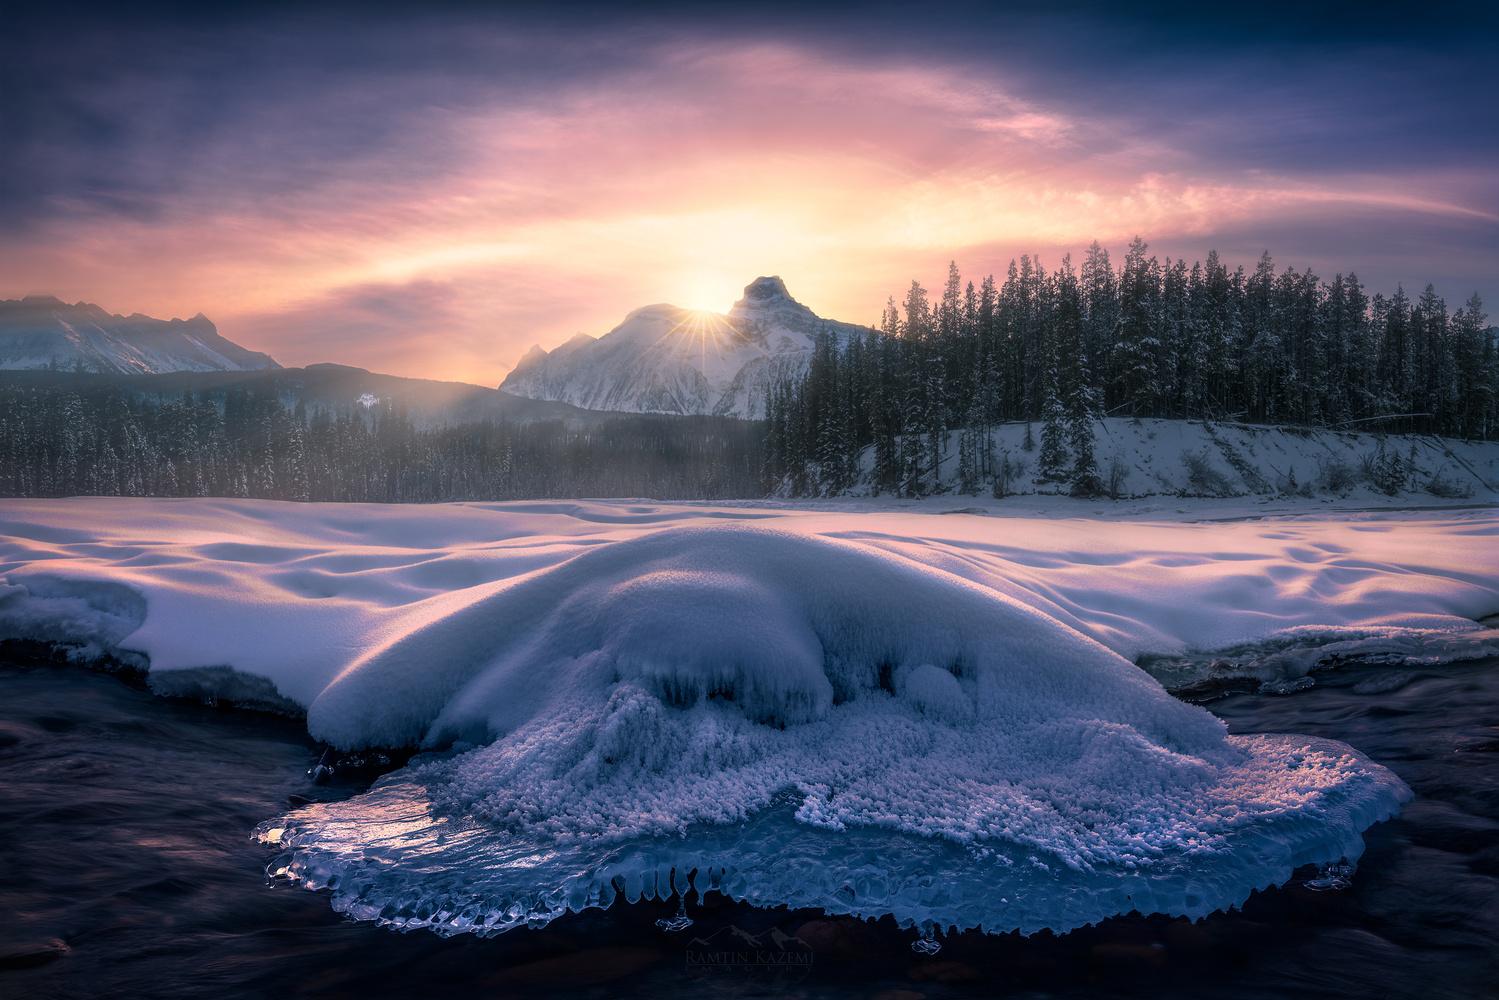 Ballad of the Rockies by Ramtin Kazemi